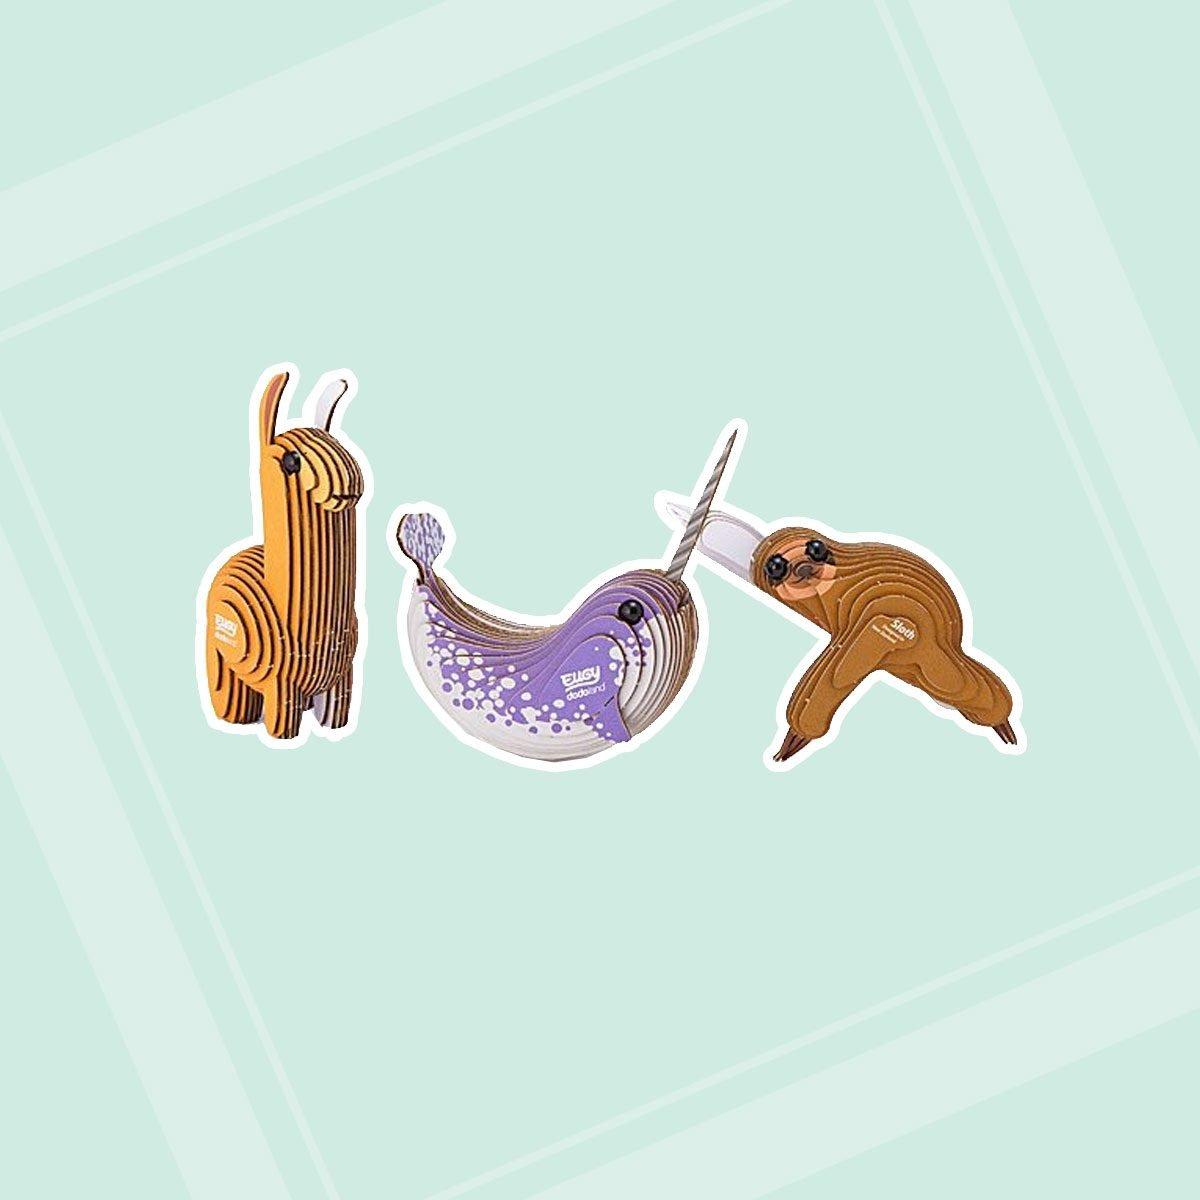 Mini Creature 3D Kits